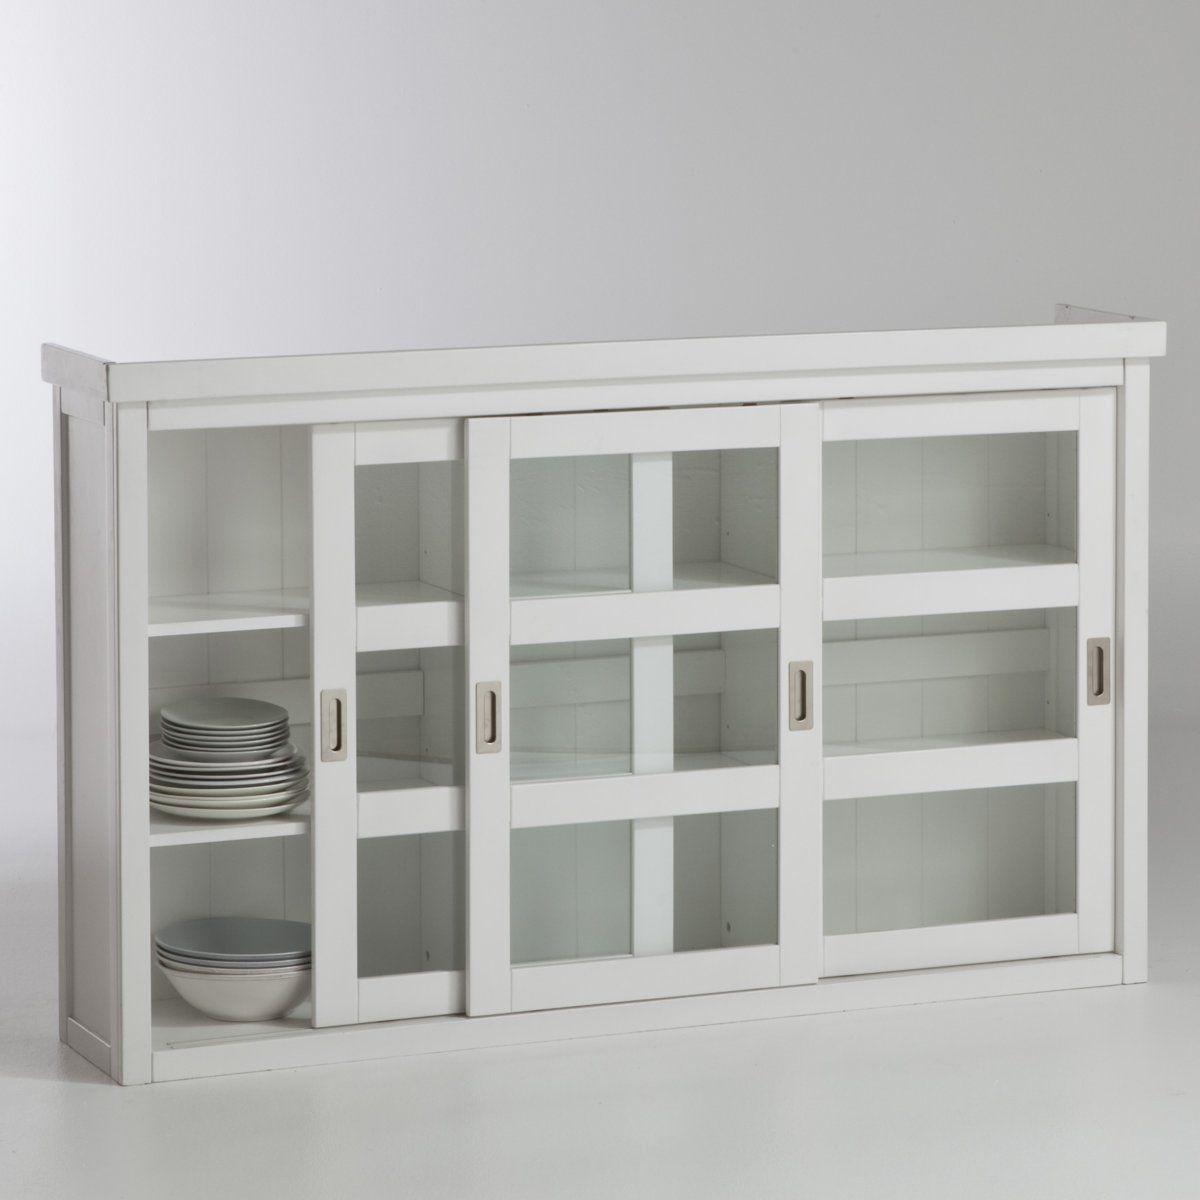 vente vaisselier tritoo maison et jardin. Black Bedroom Furniture Sets. Home Design Ideas